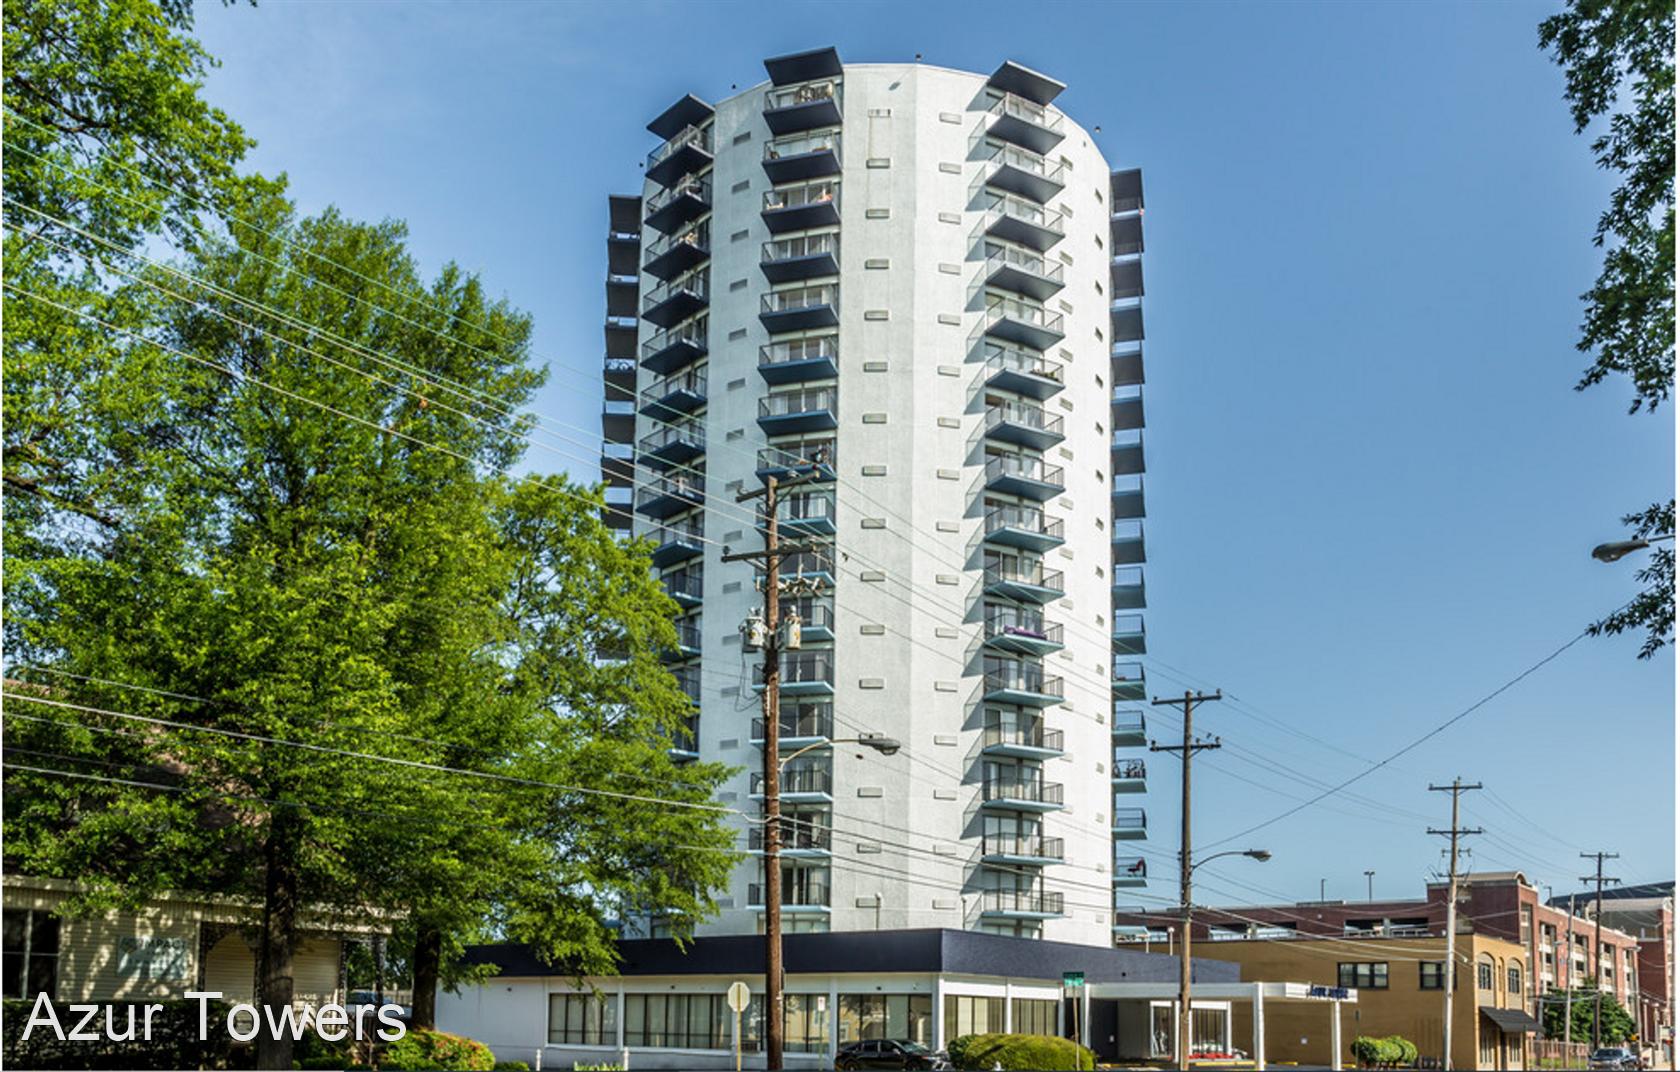 Azur Tower rental